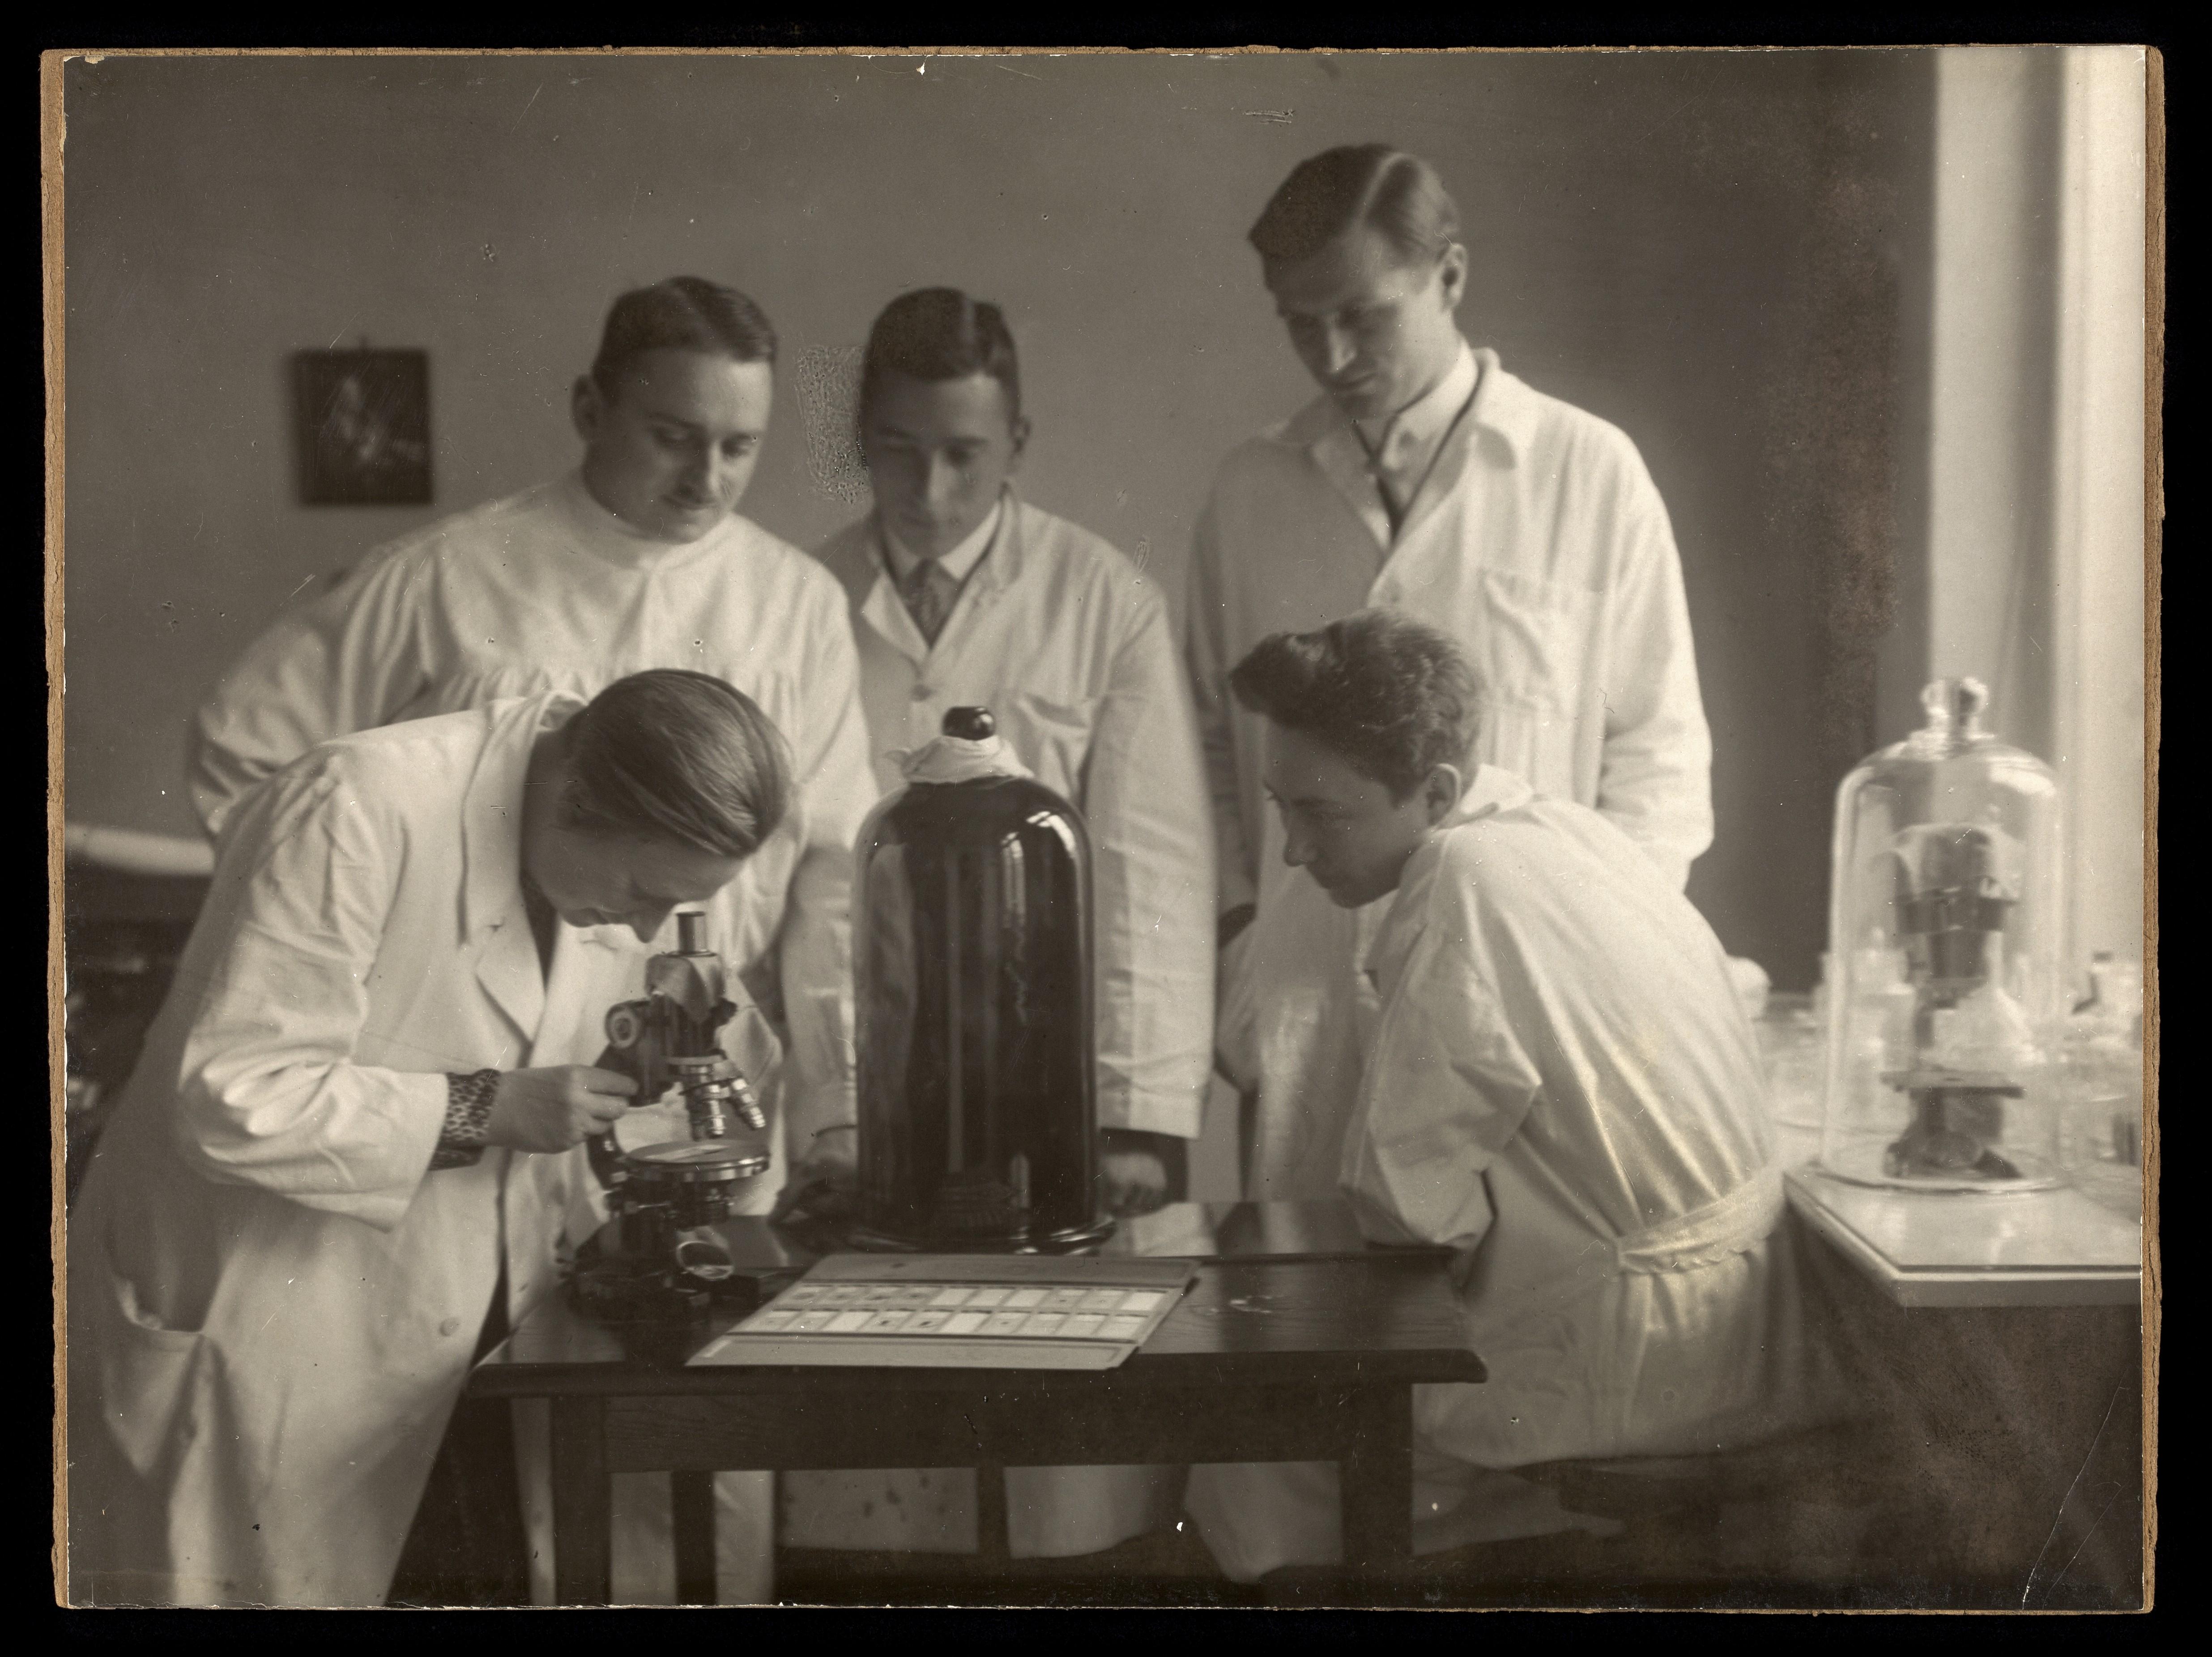 Erdmann (left) in her Berlin laboratory, 1929